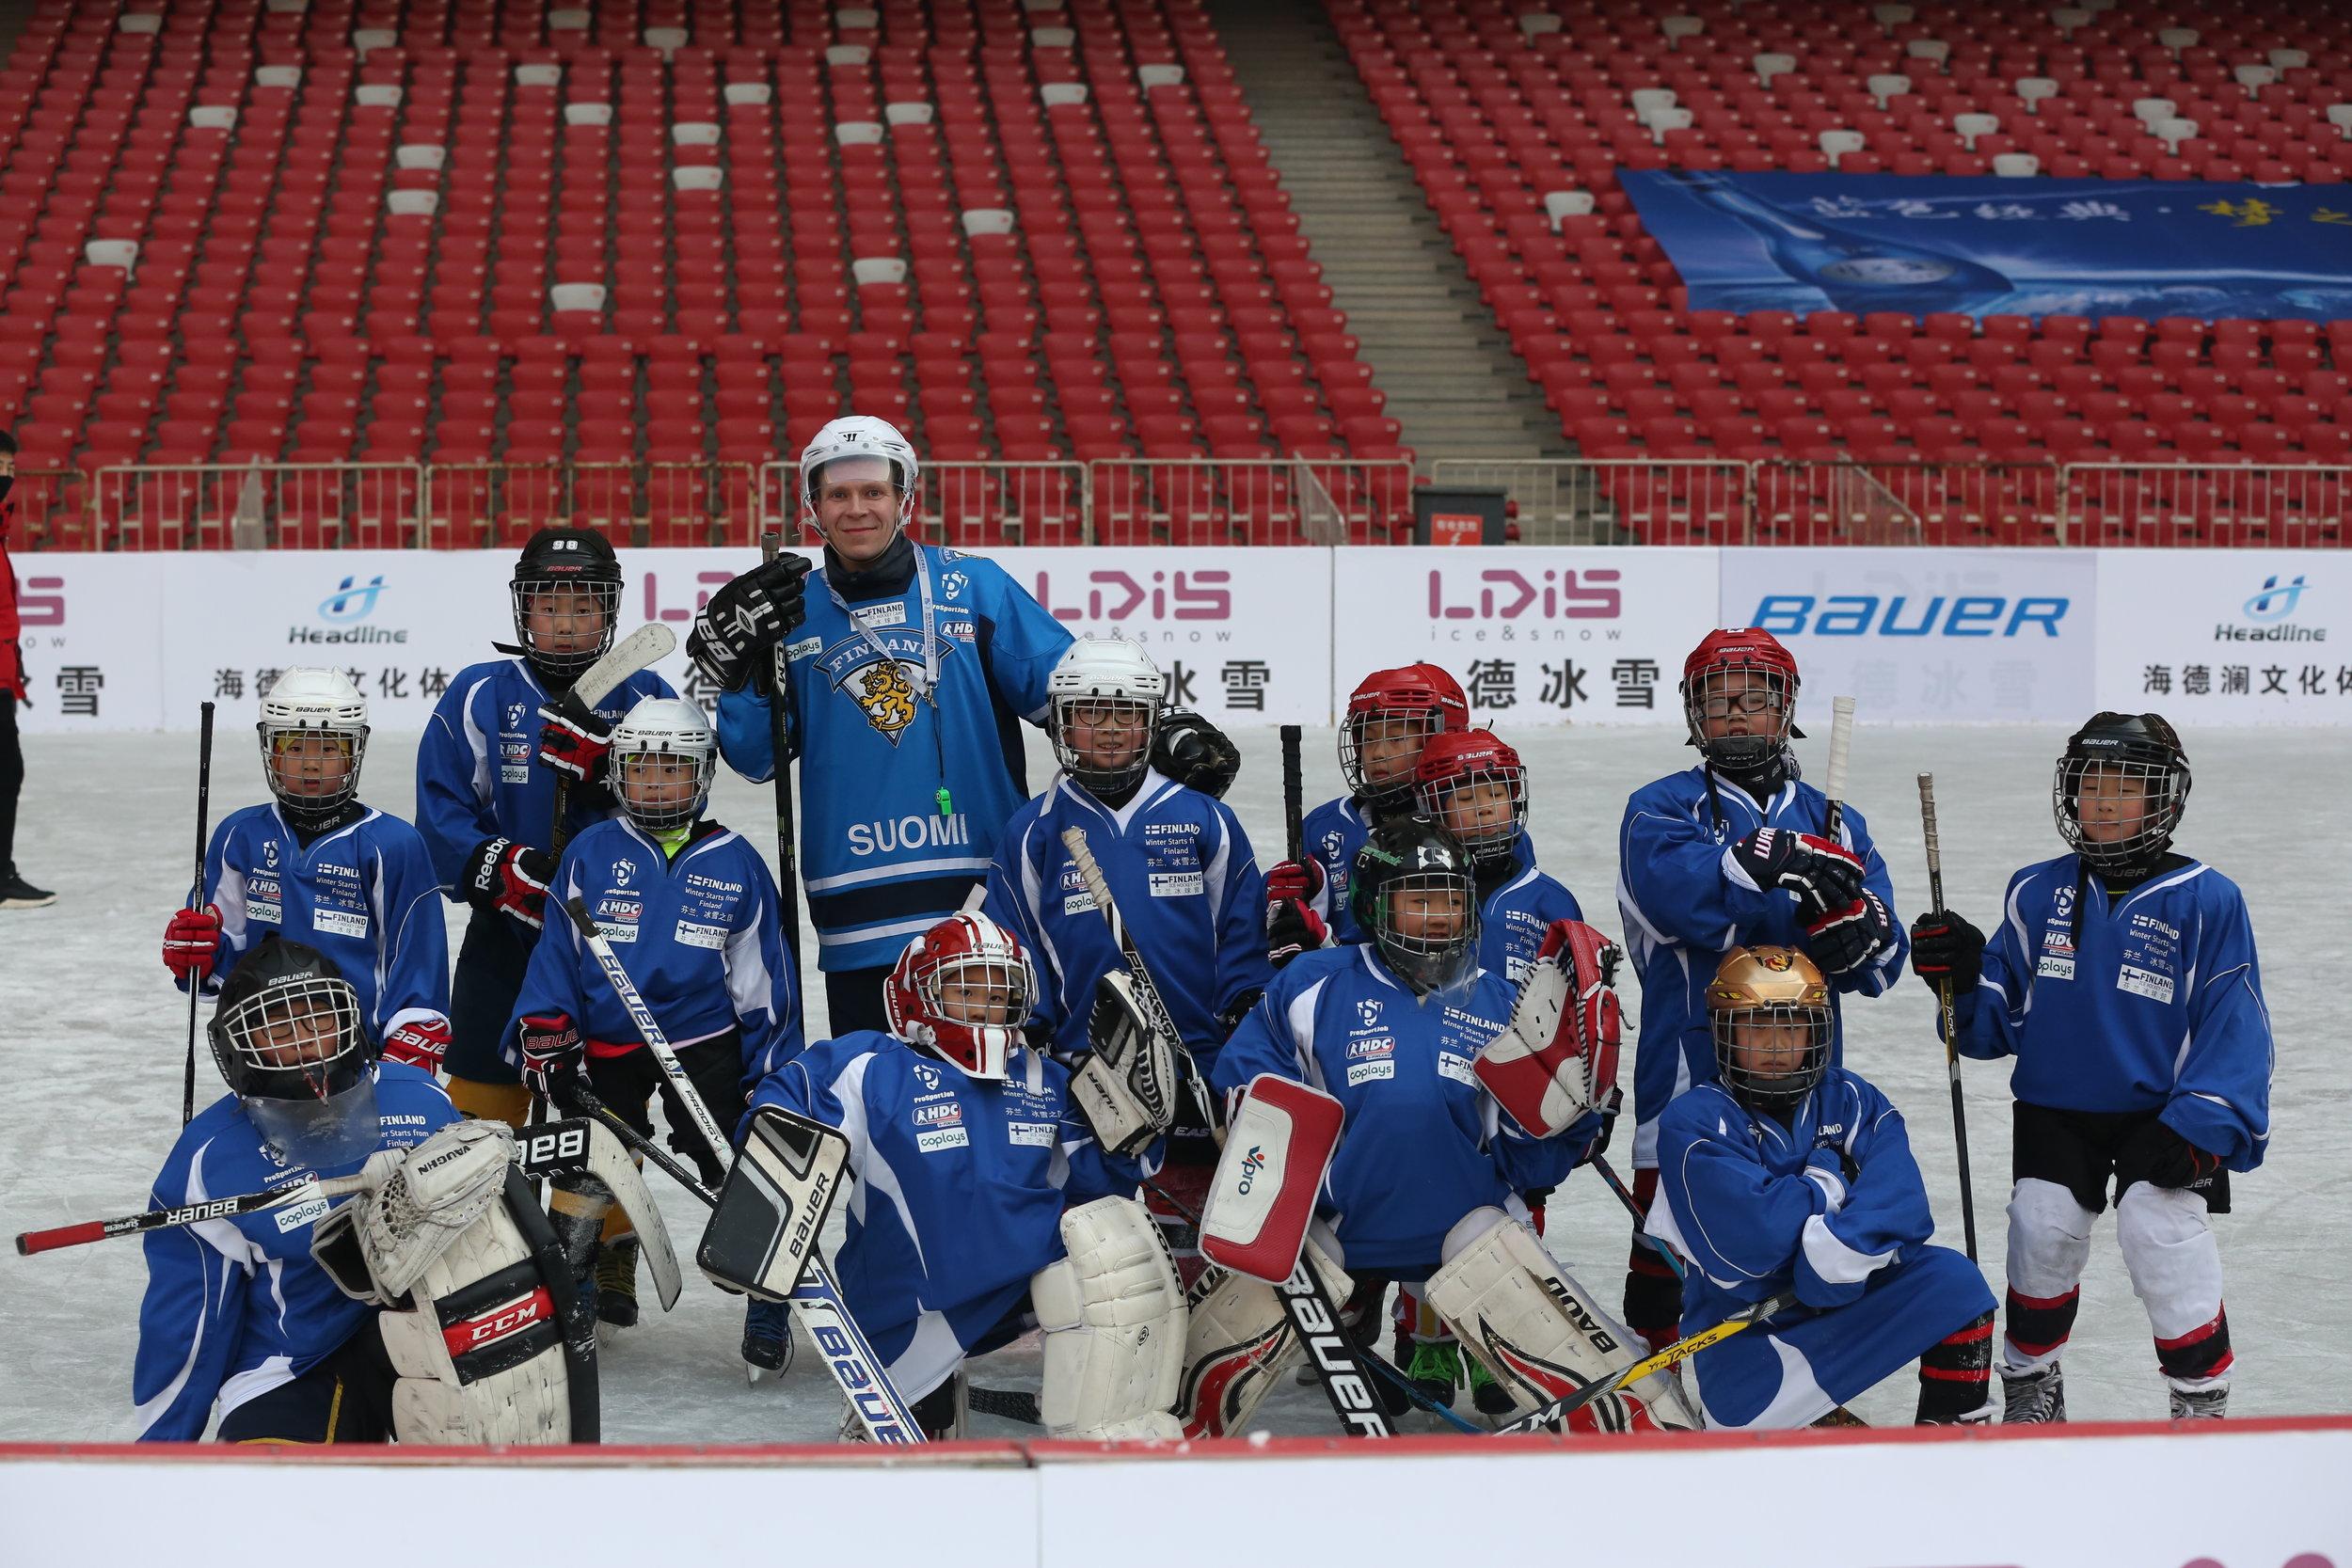 ice_hockey_junior_training_sasu_hovi_birds_nest_beijing_china